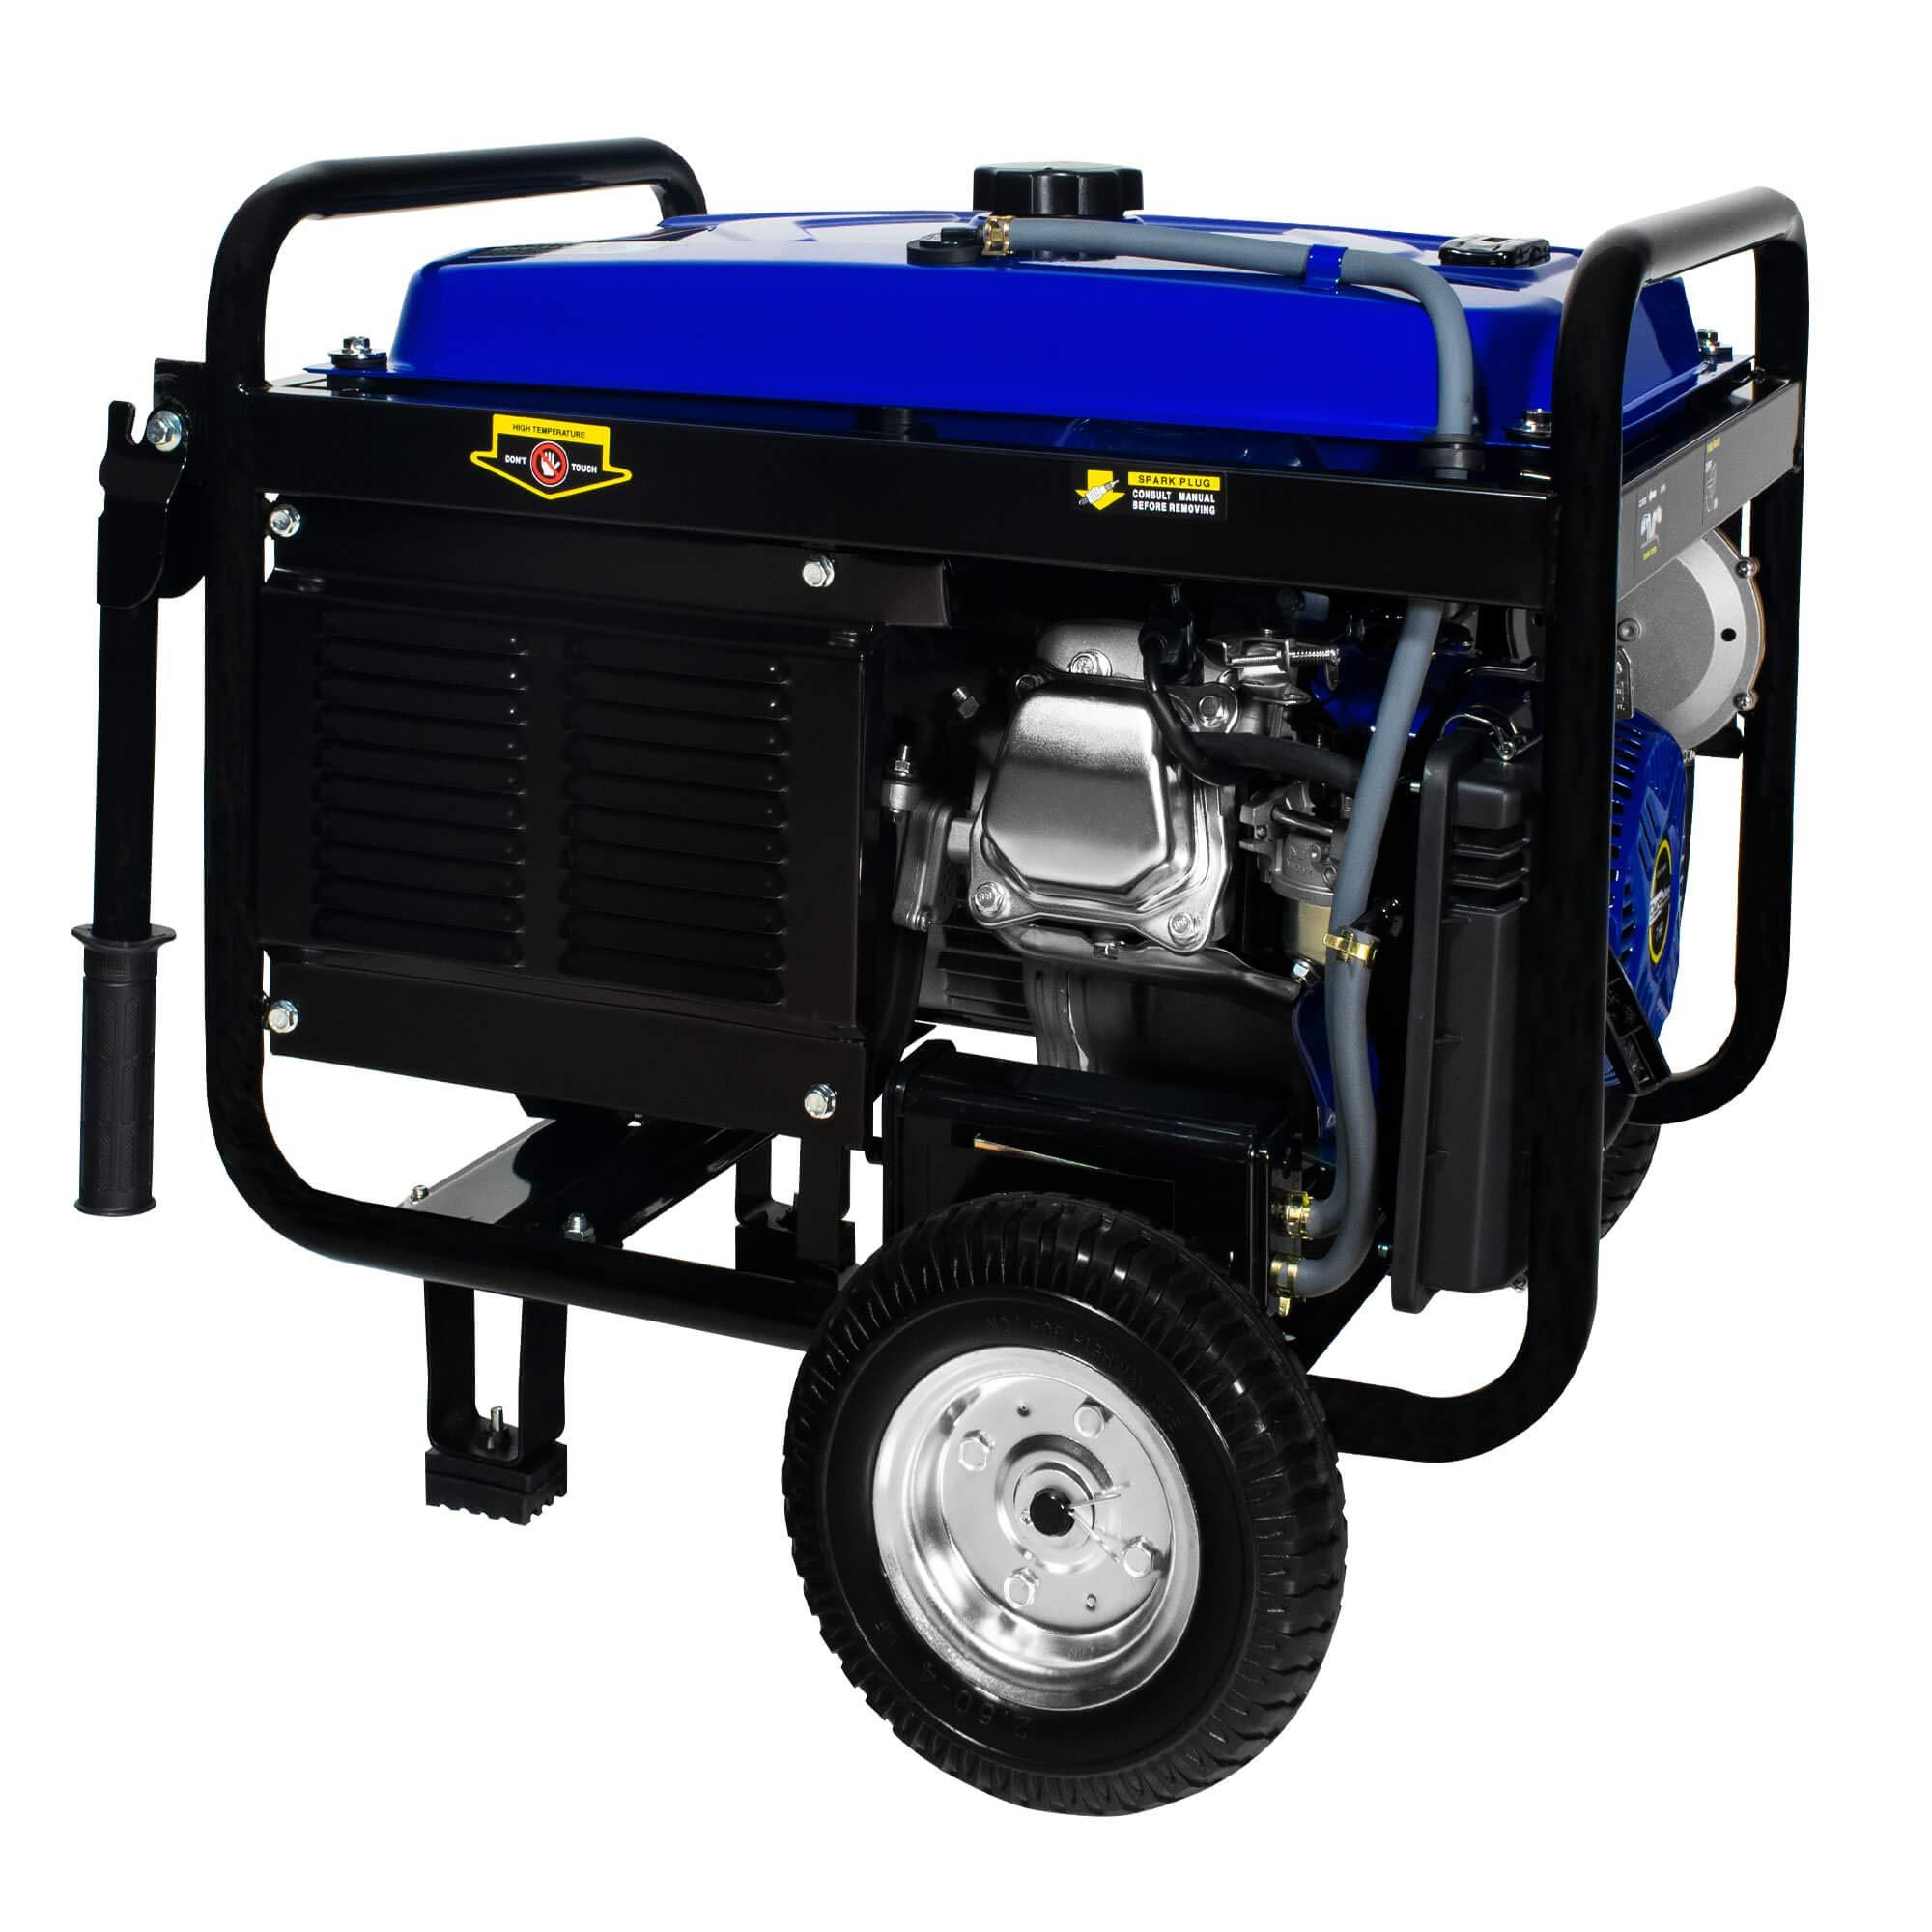 DuroMax Hybrid Dual Fuel XP4400EH 4,400-Watt Portable Generator by DuroMax (Image #8)